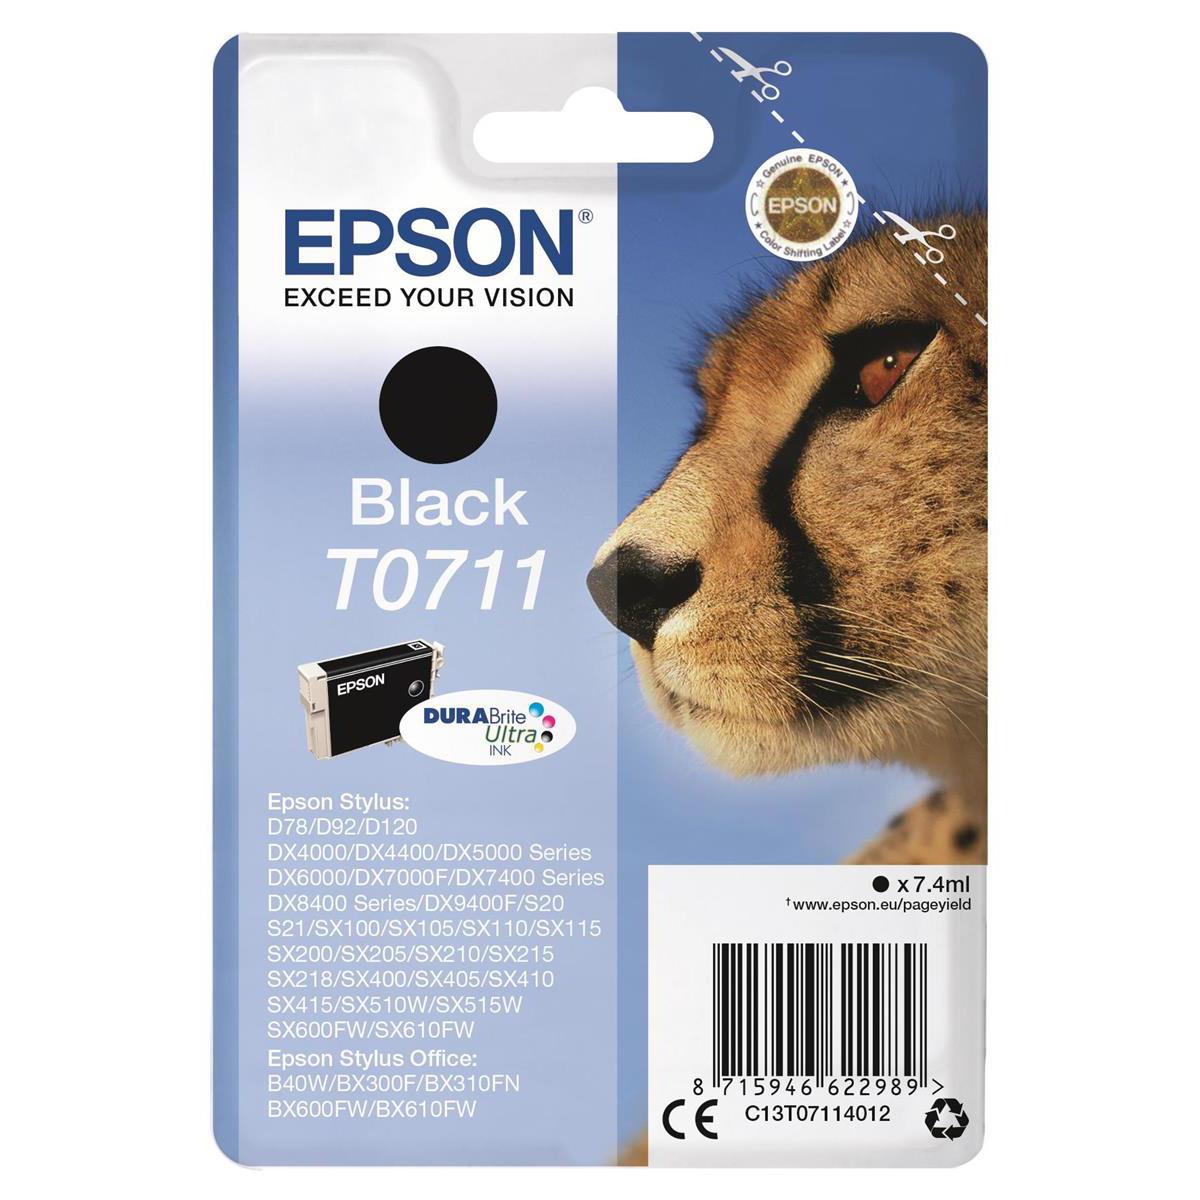 Epson stylus s21 driver download windows, mac, linux epson drivers.